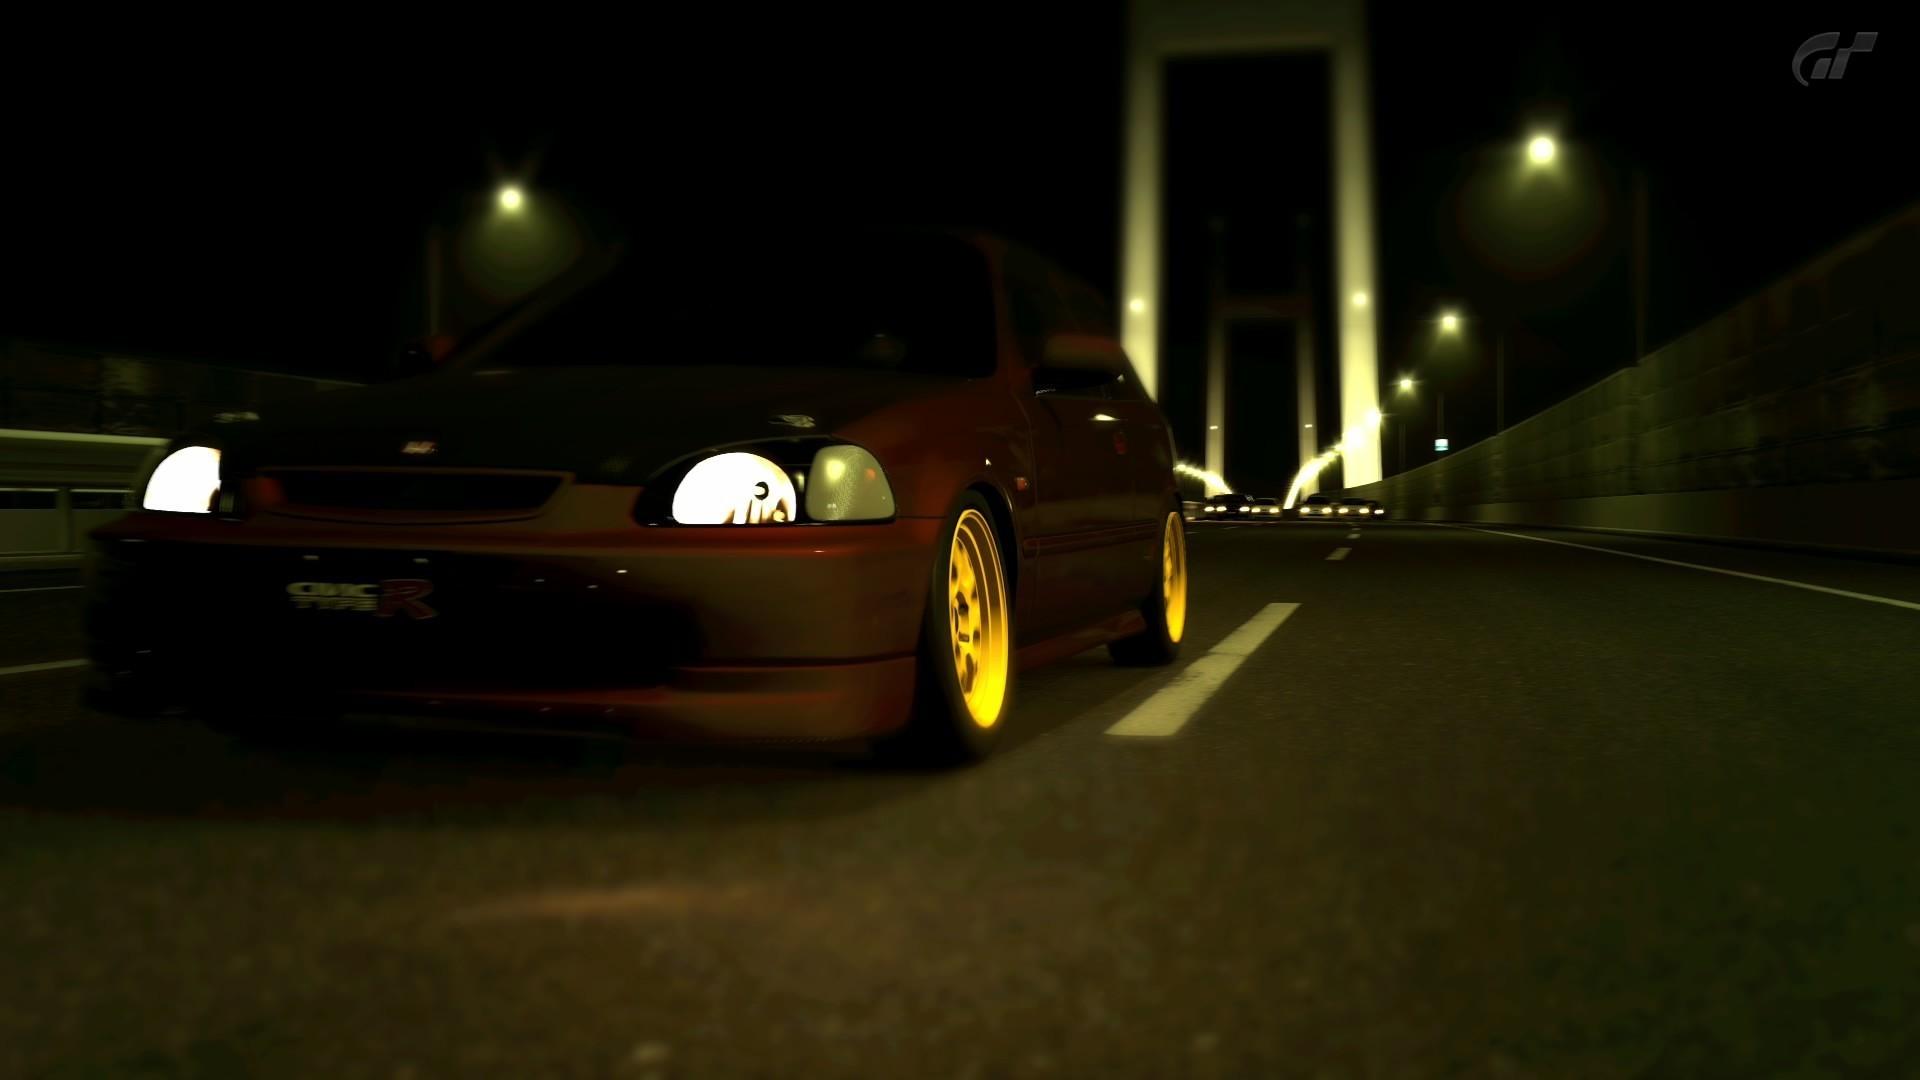 honda-civic-playstation-cars-vehicles-1920x1080-honda-civic-playstation-cars-vehicles-vi-wallpaper-wpc5801495